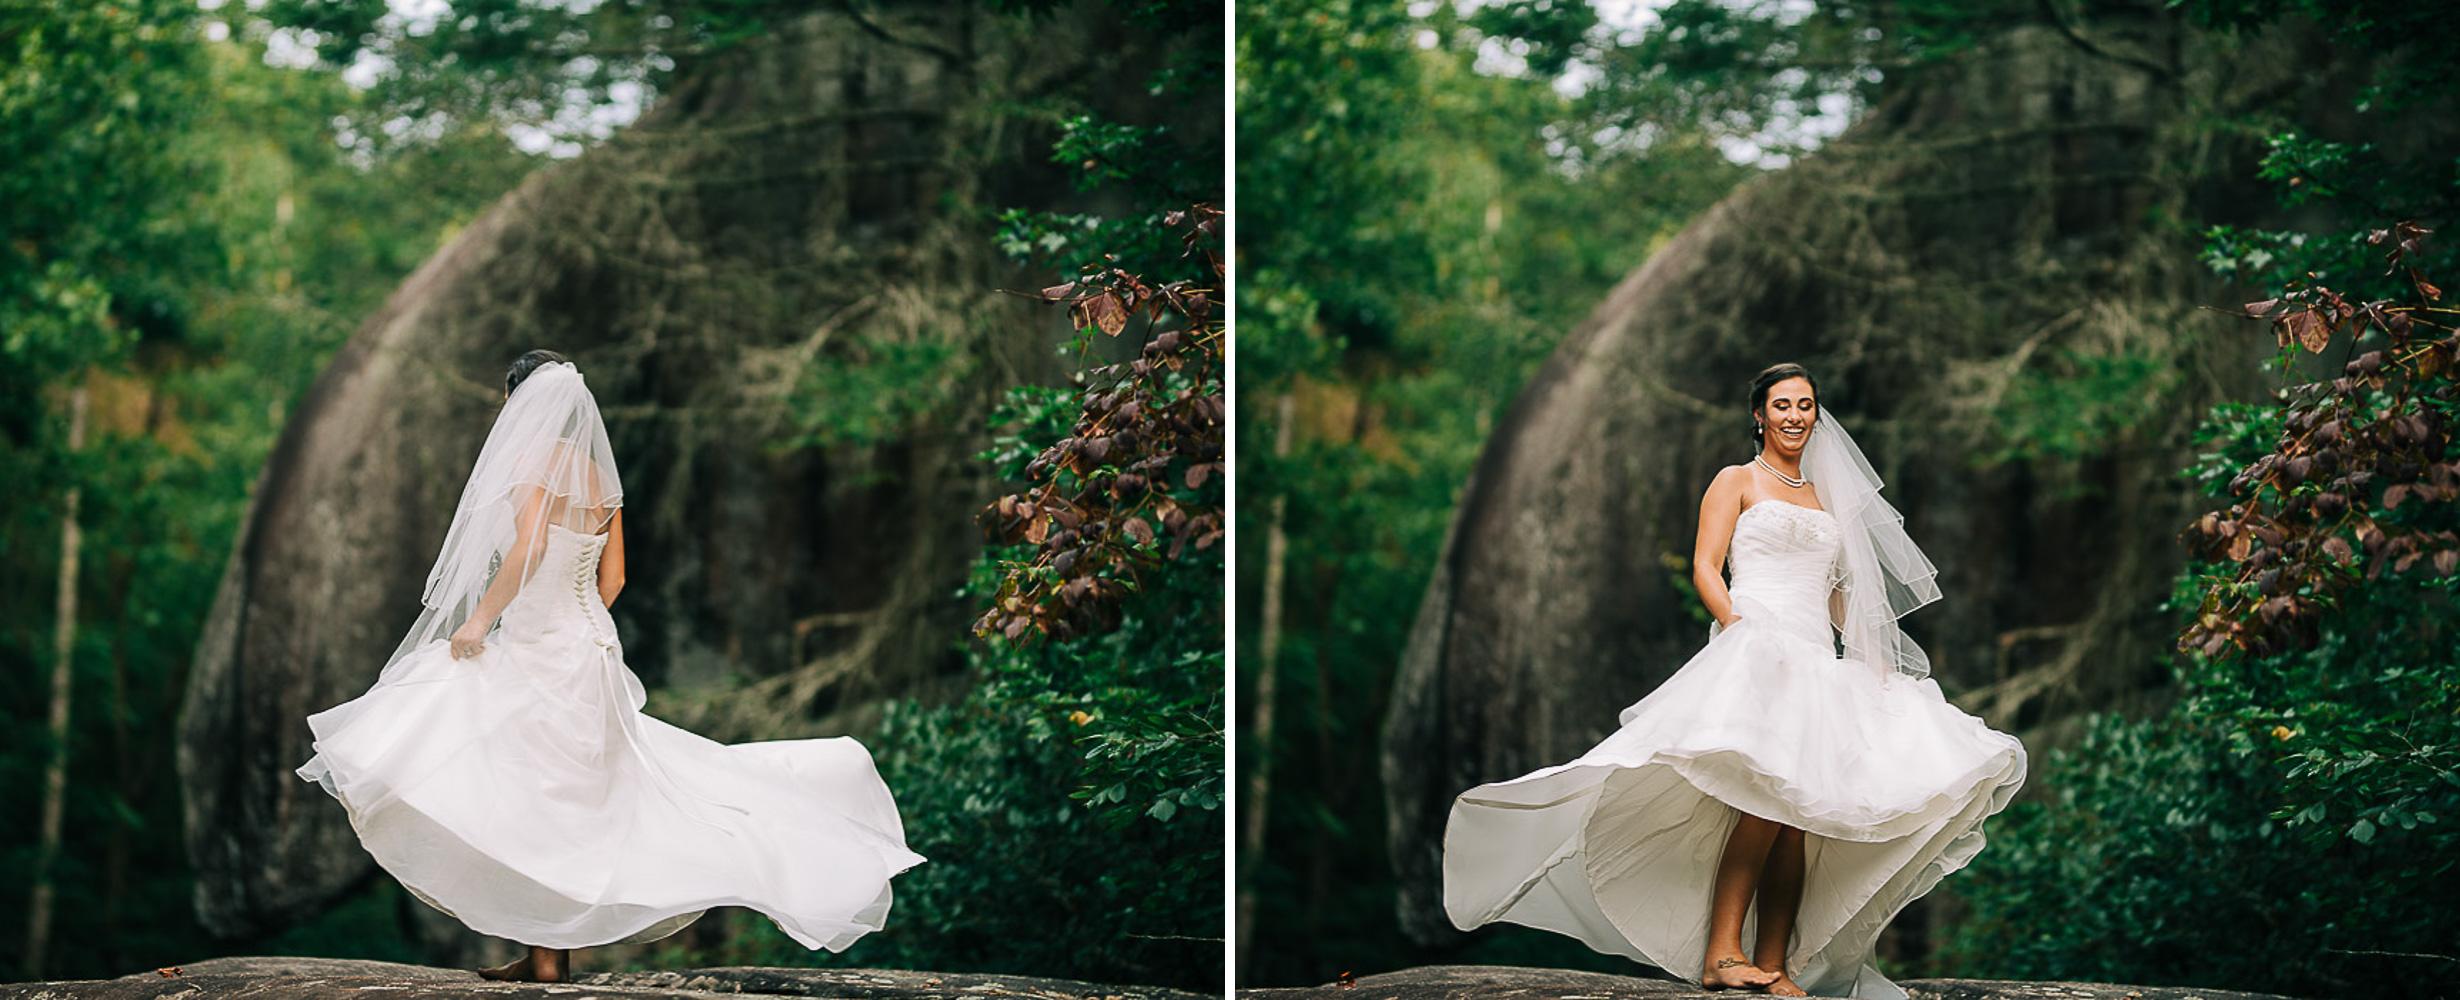 River Bridal Portraits, South Carolina Wedding Photographer, 07.jpg